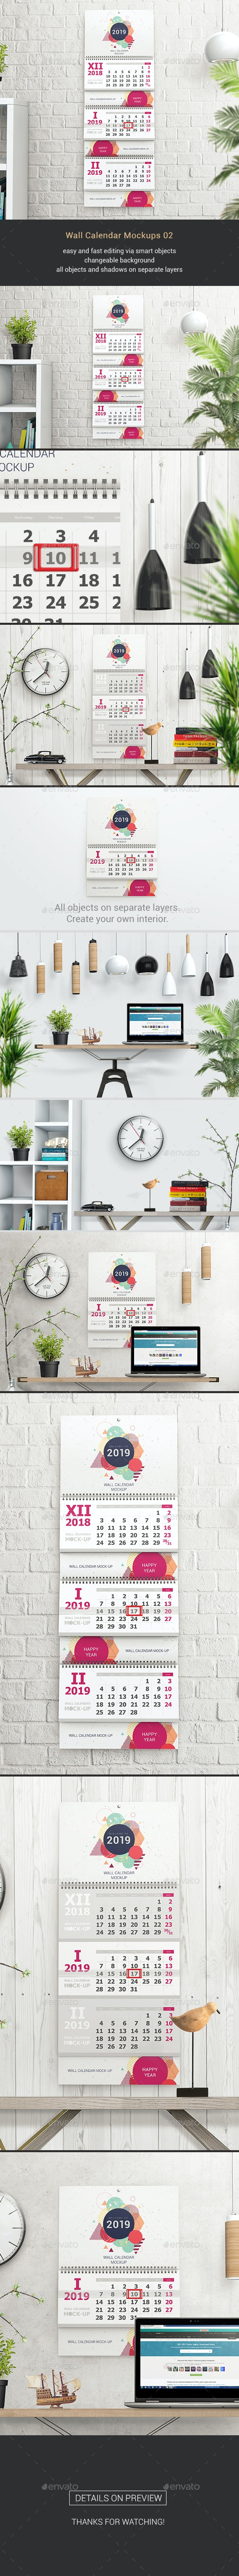 Wall Calendar Mockups 02 - Miscellaneous Print